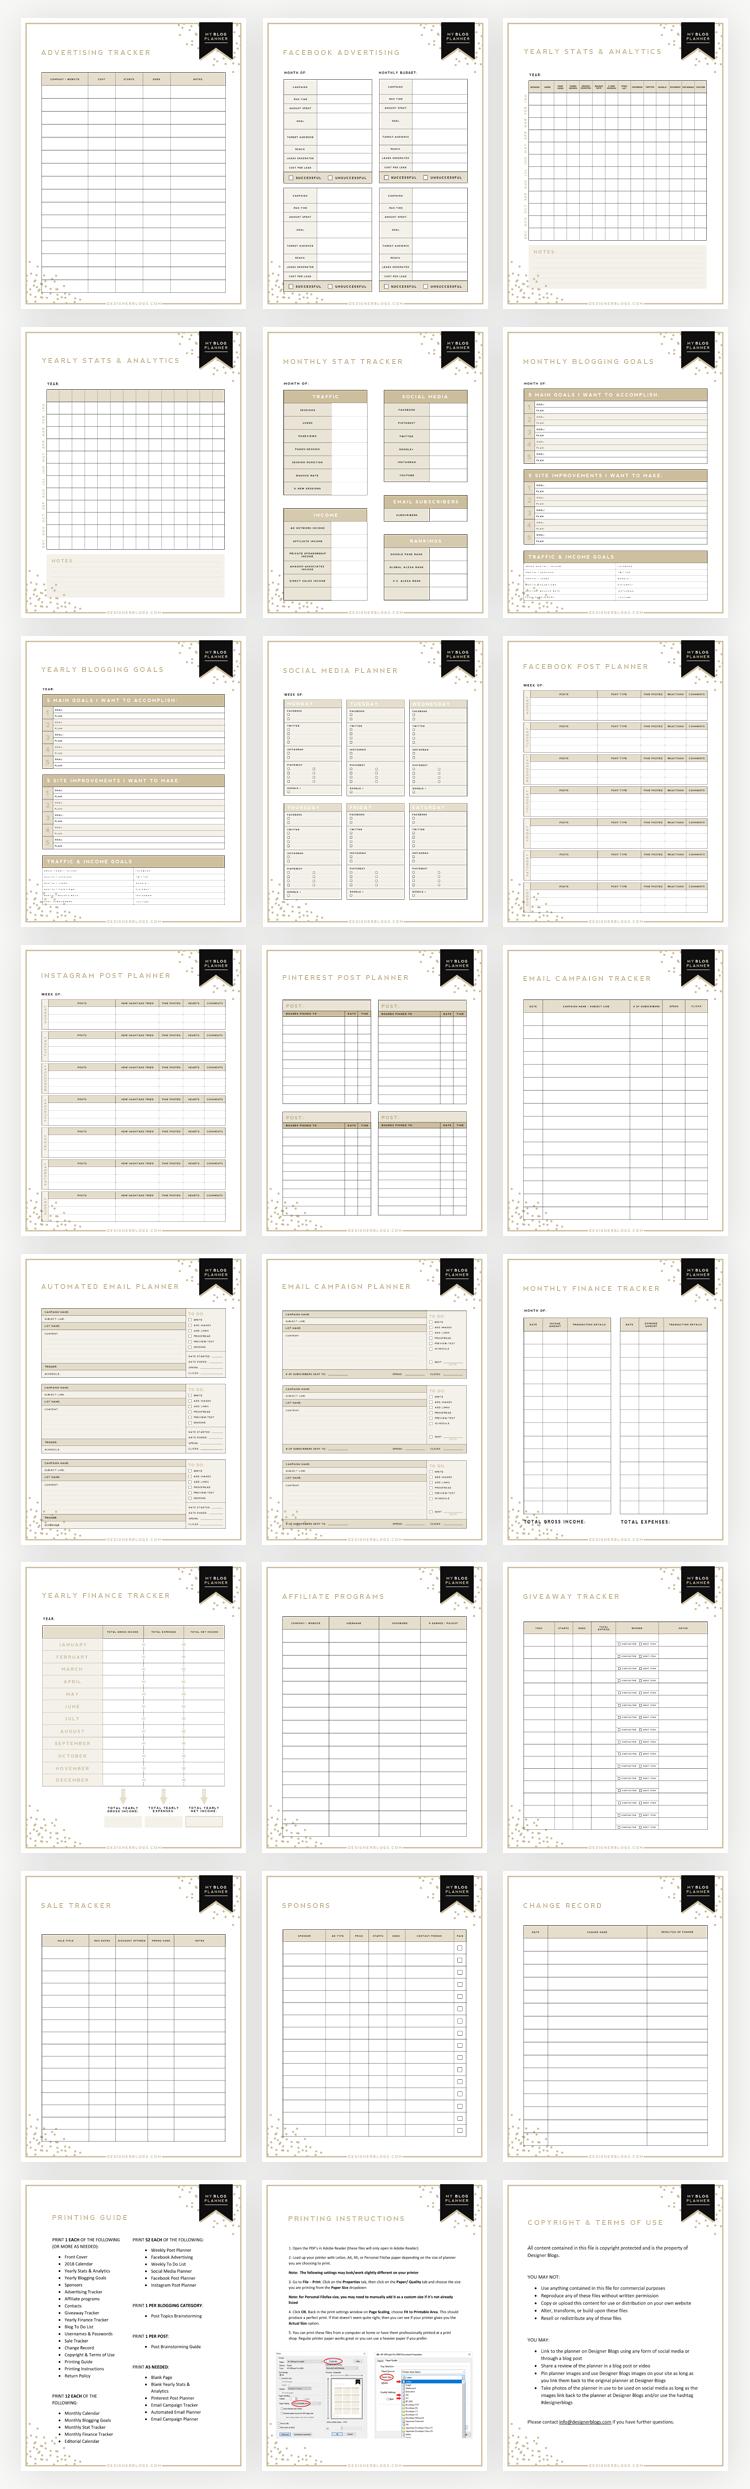 ultimate blog planner extension